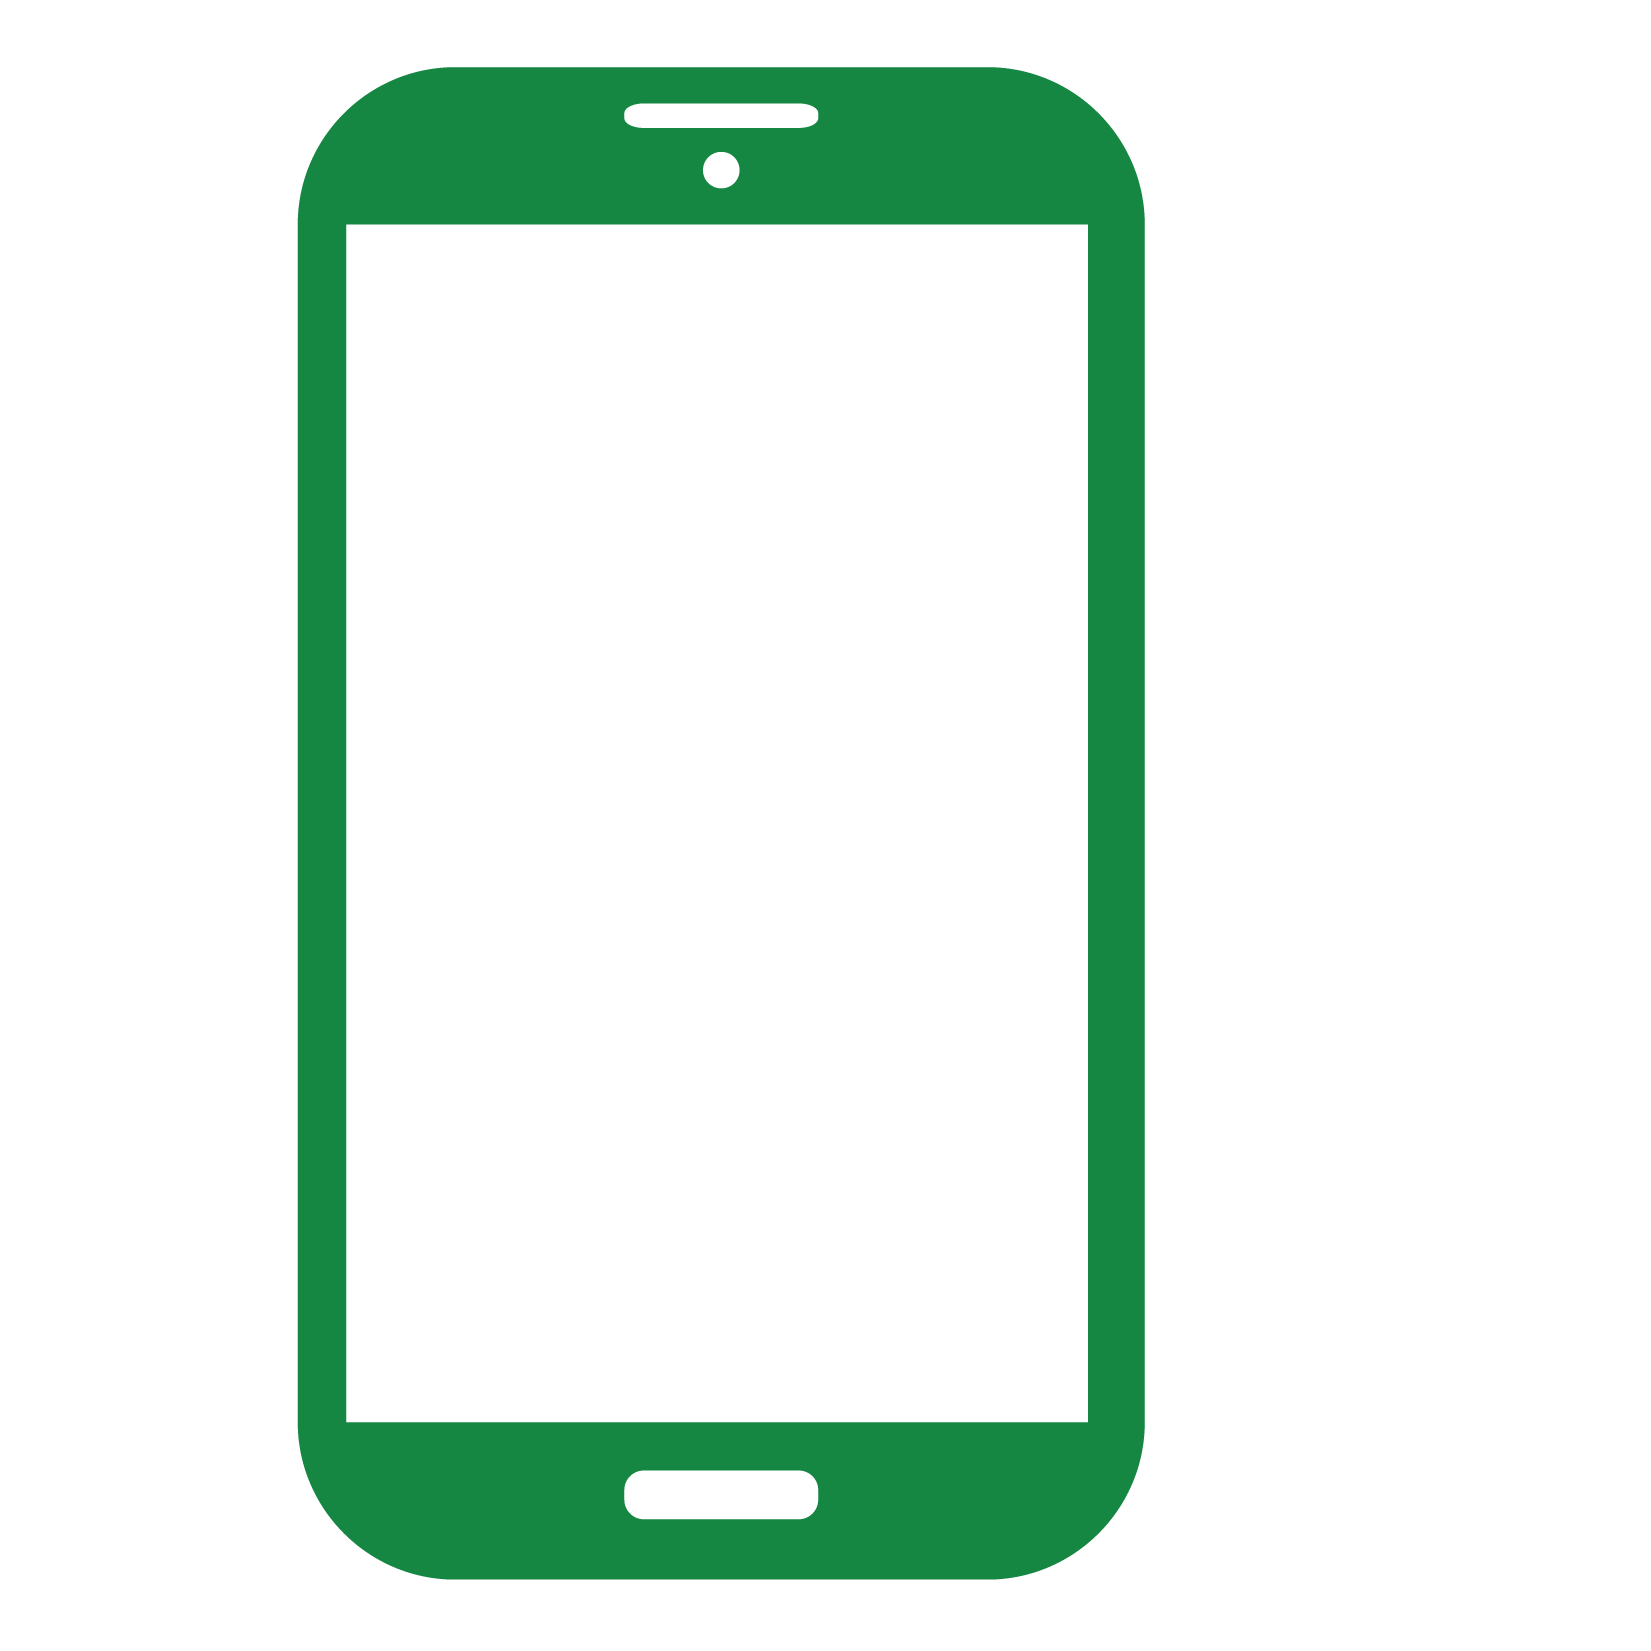 Phone-10-10.png